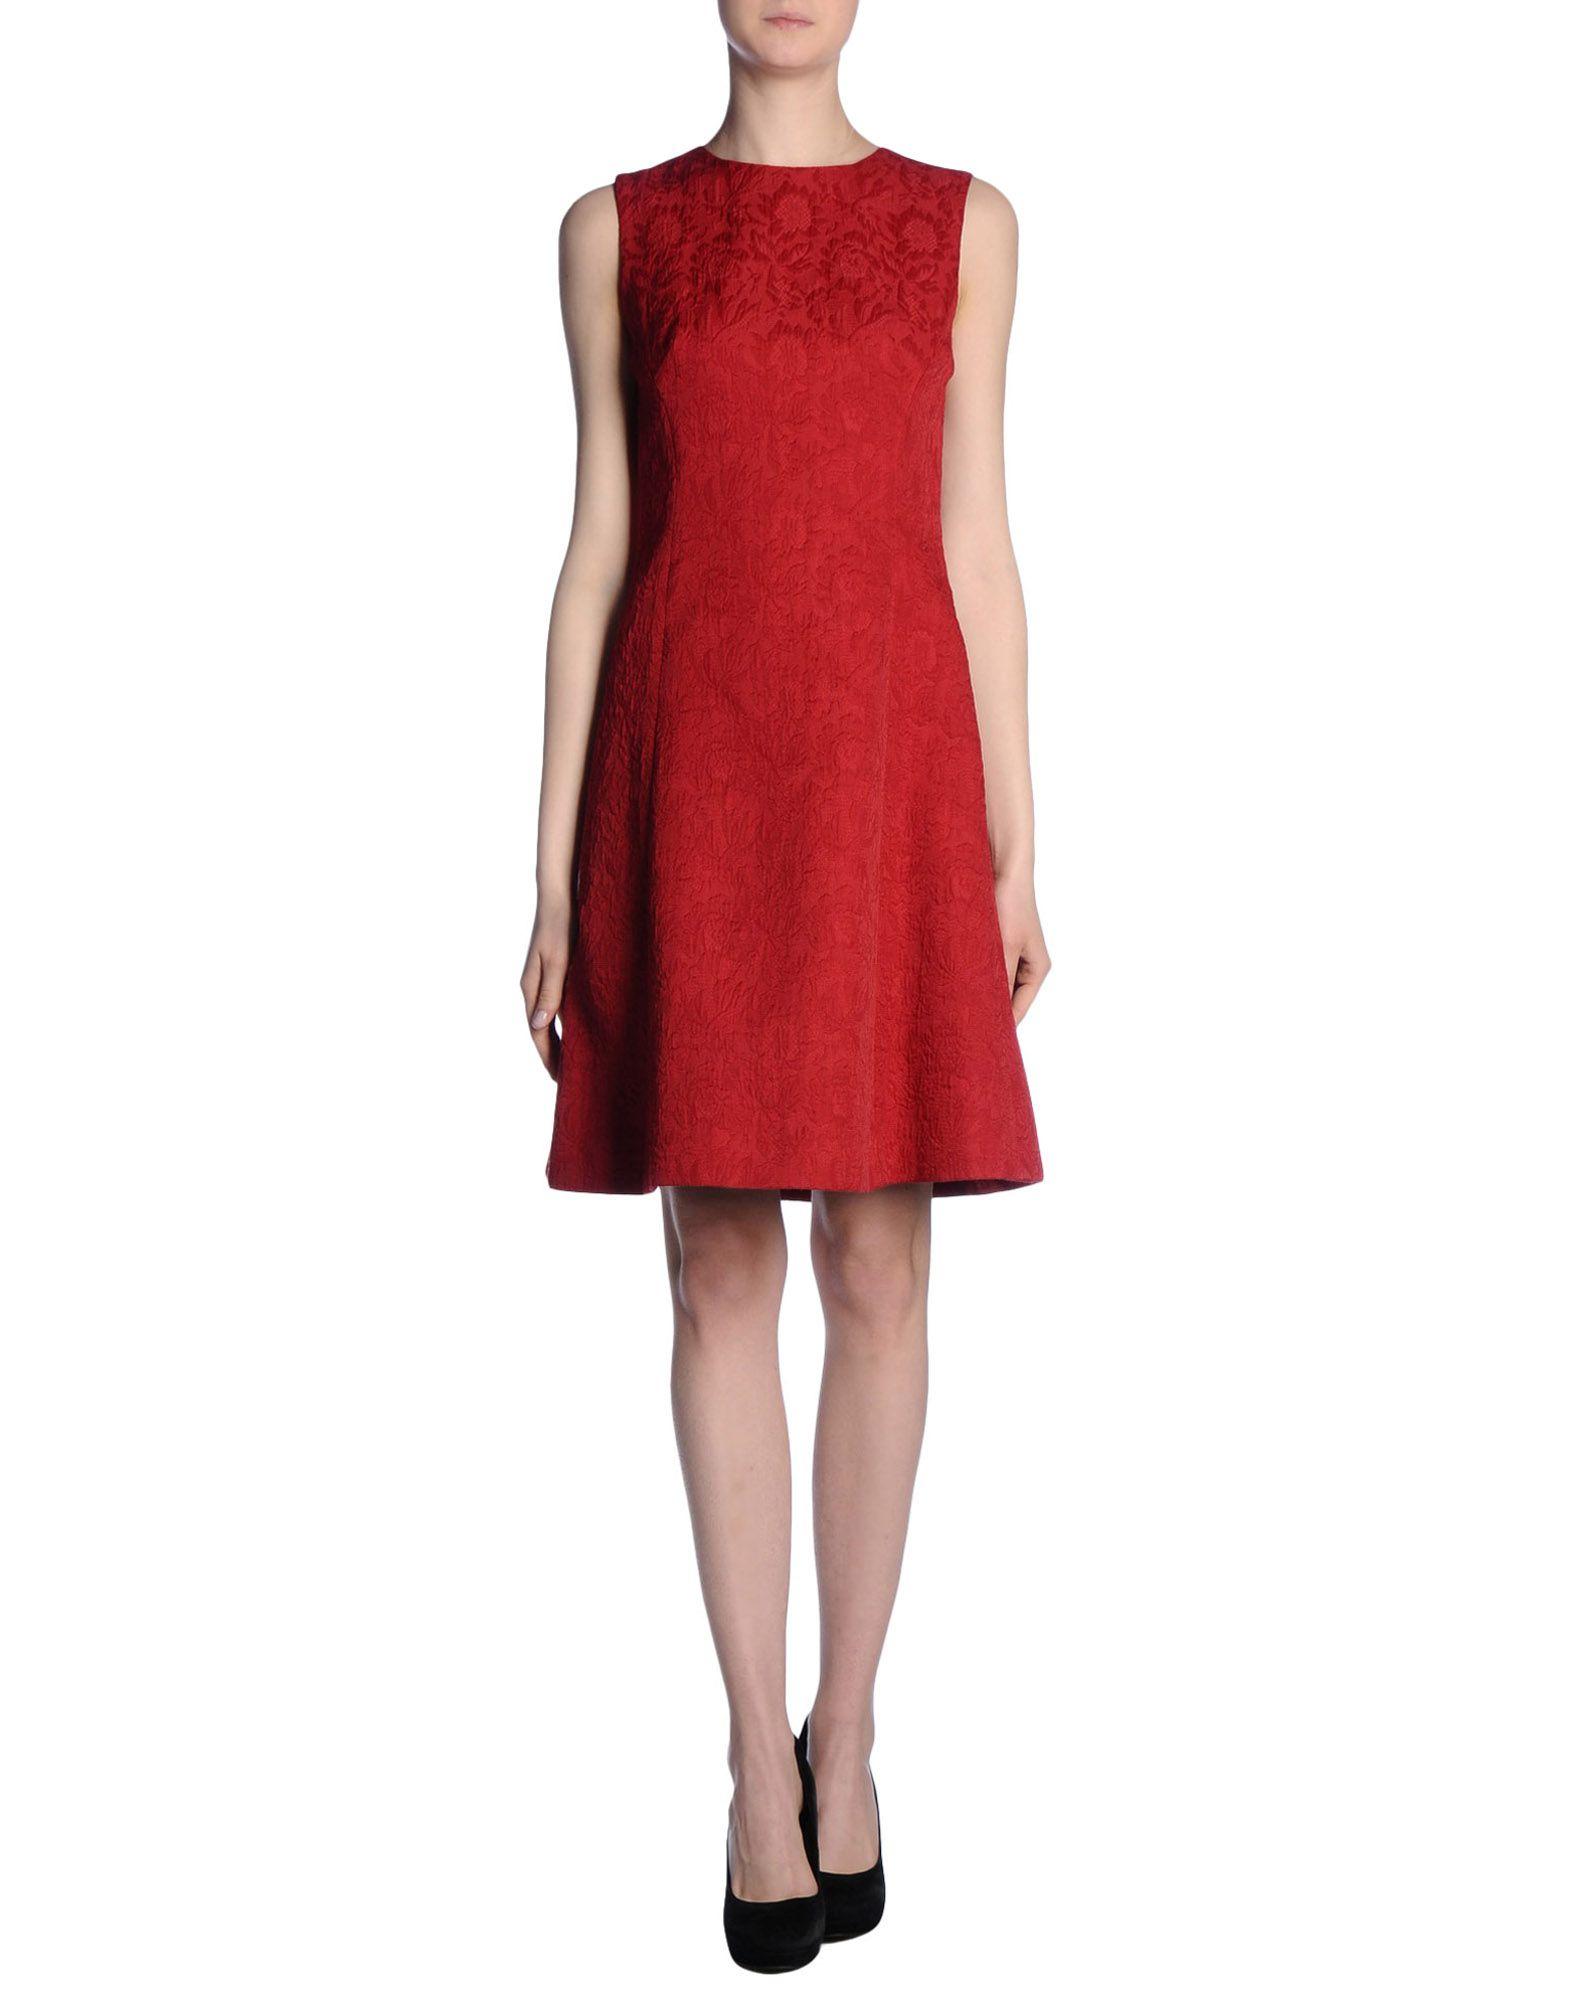 Dolce  amp  gabbana Short Dress in Red (Brick red)  b60d3e561